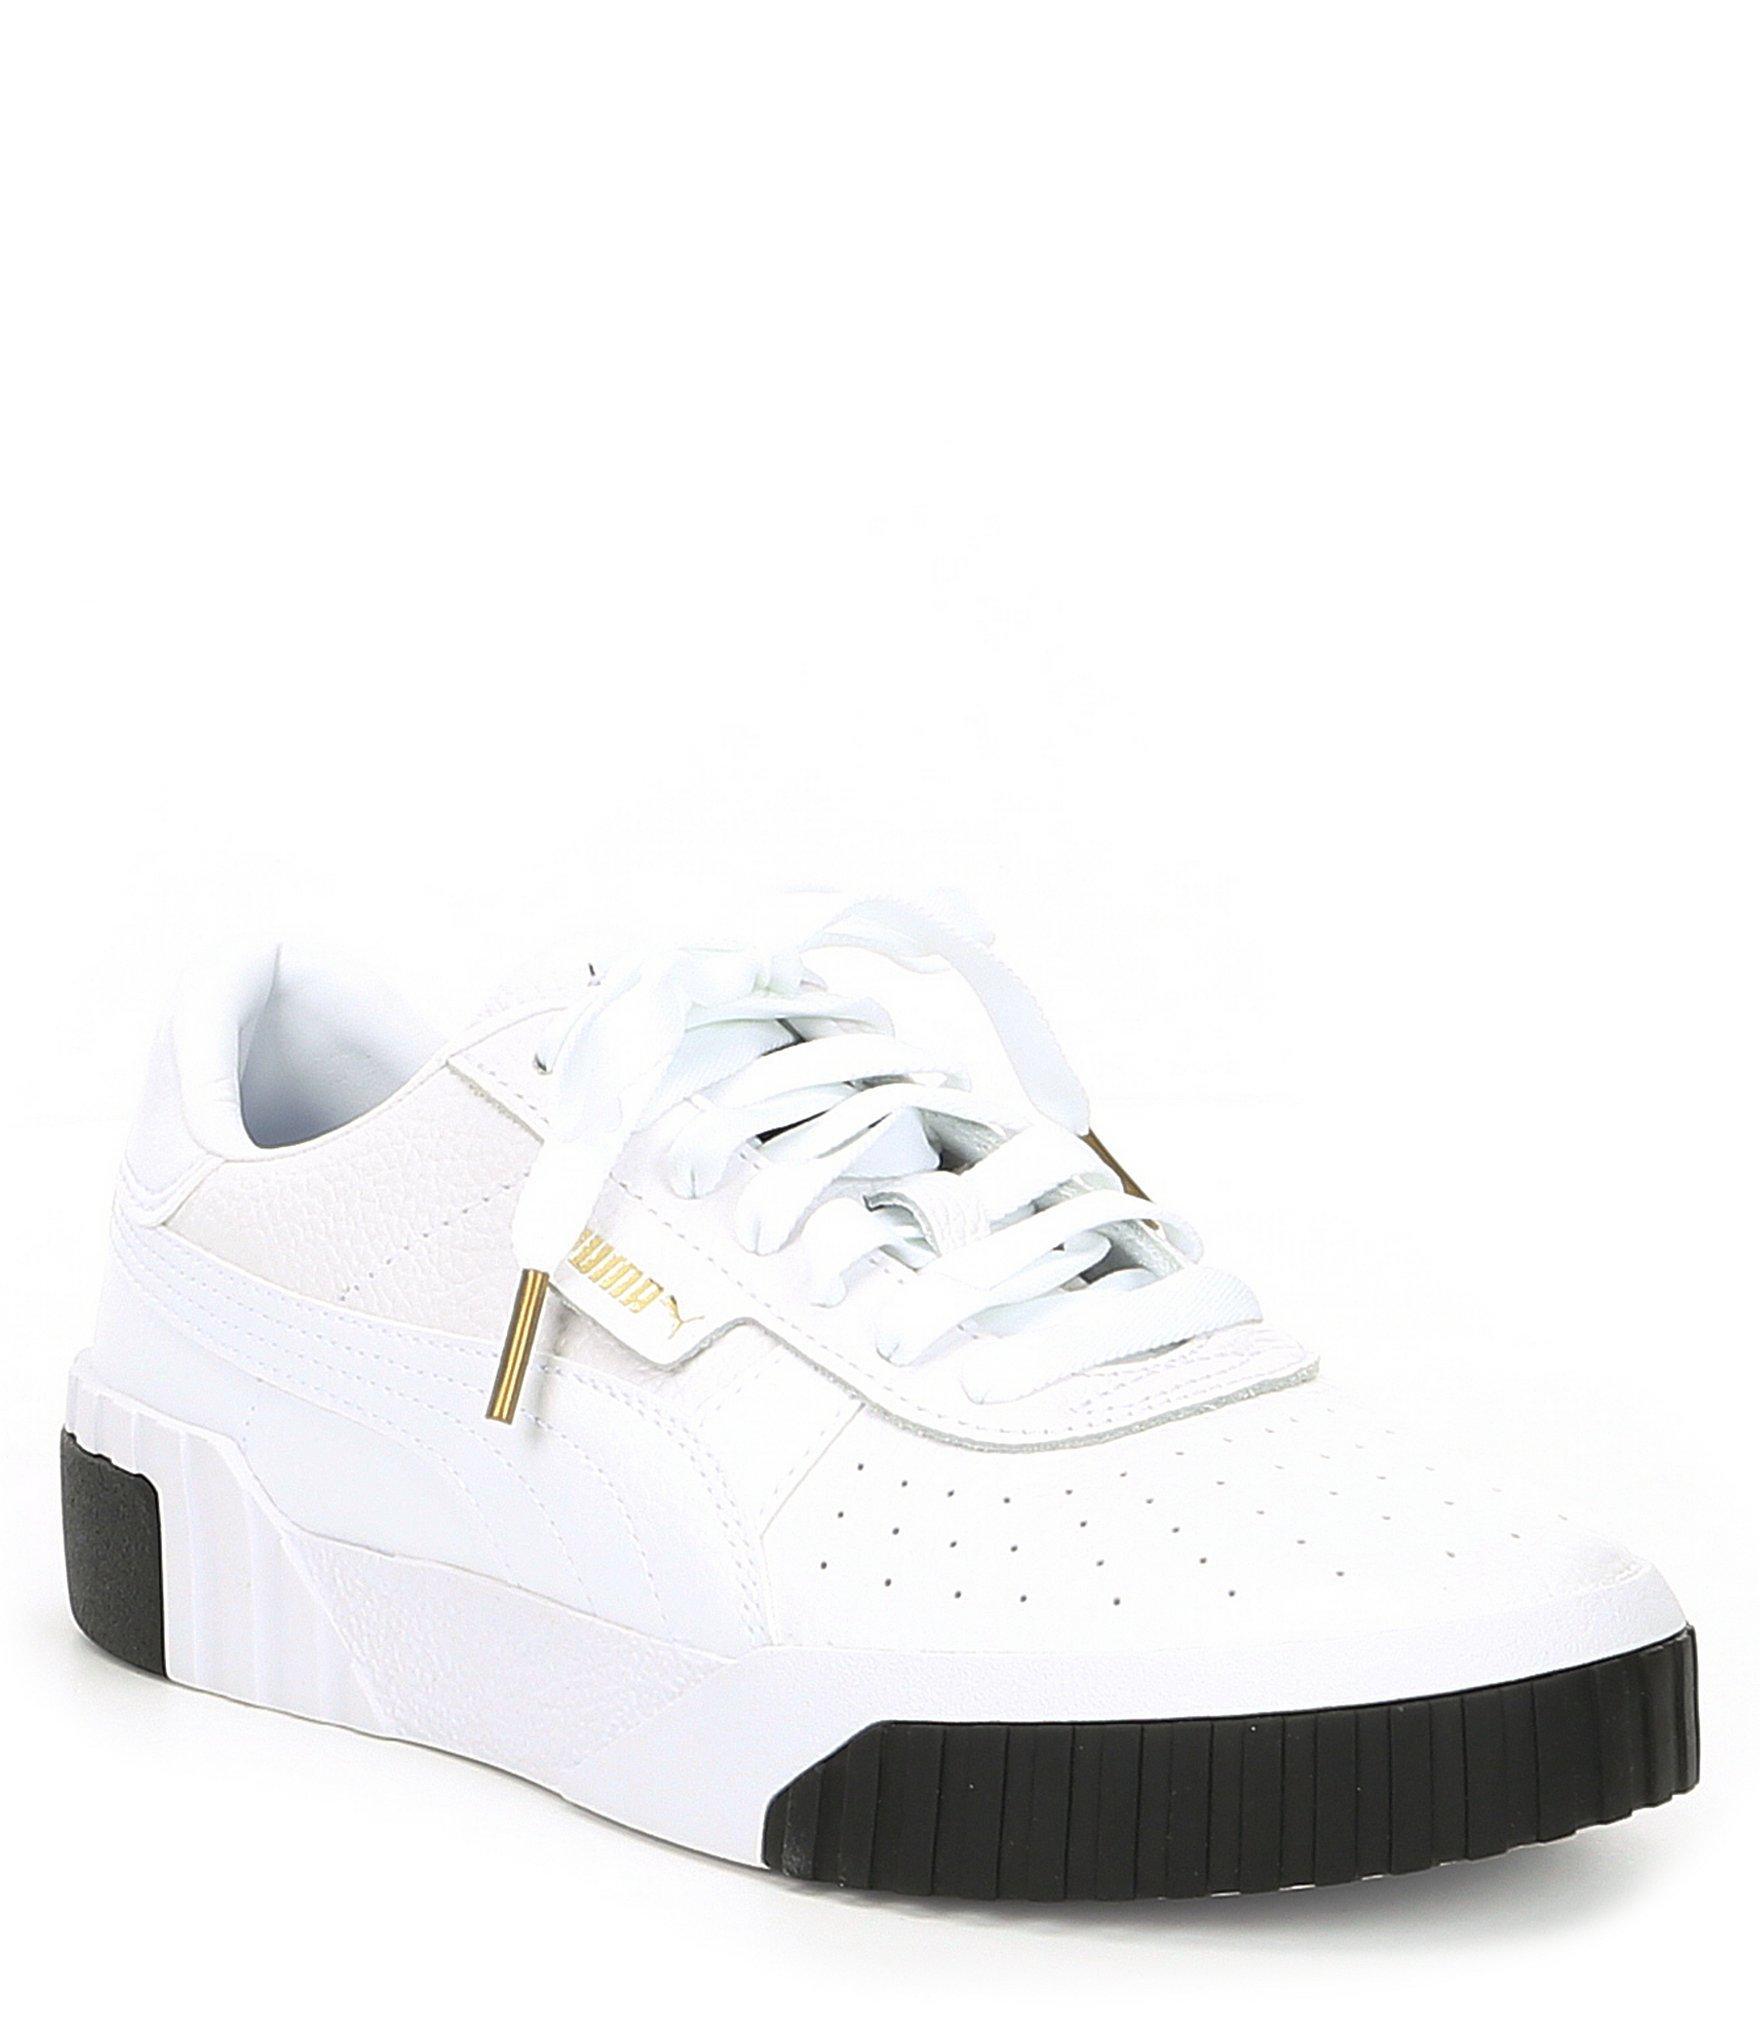 ca75ebae35e Lyst - PUMA Women s Cali Leather Sneakers in White